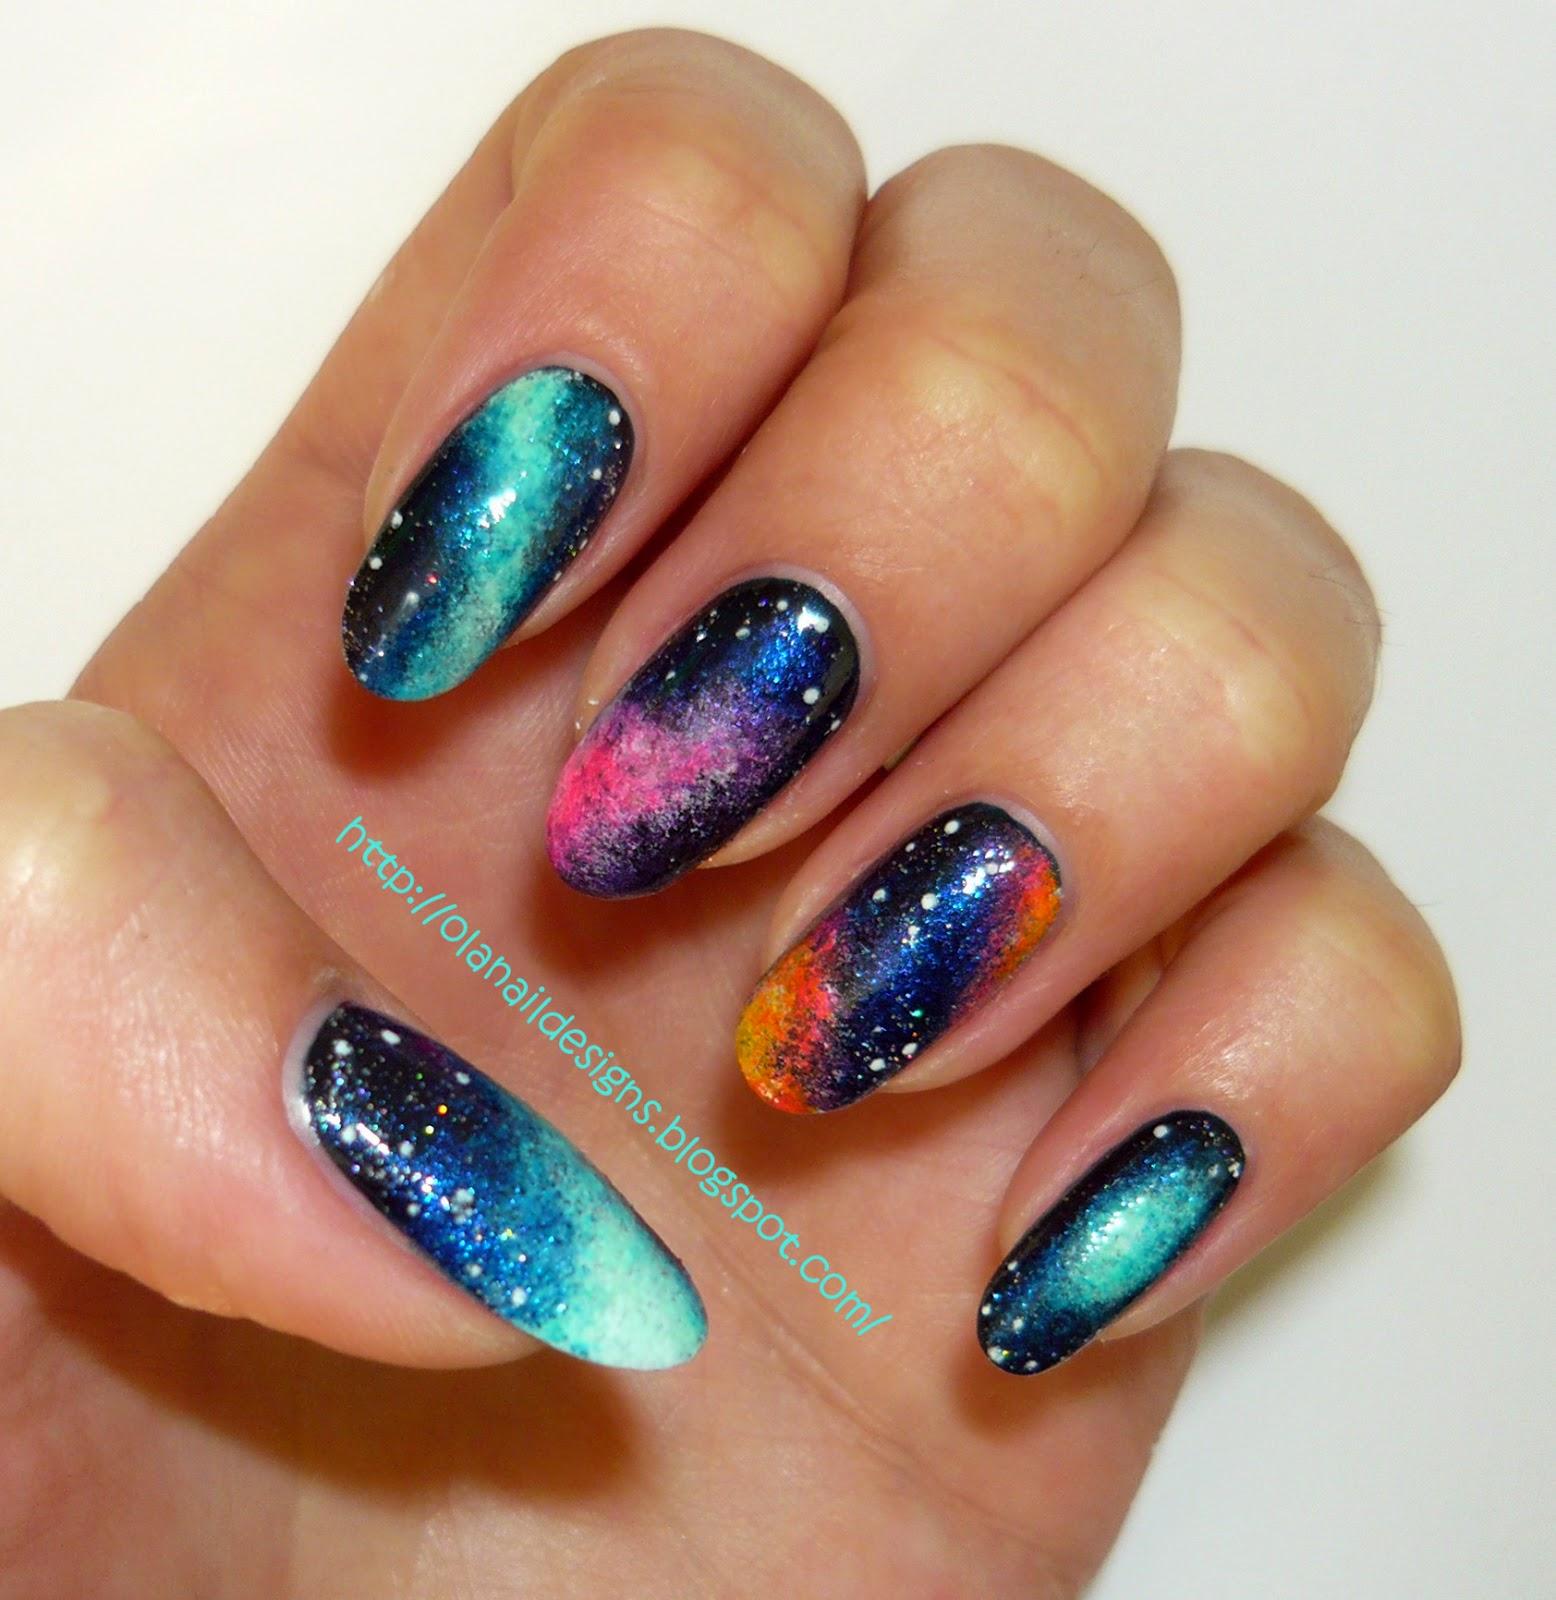 http://olanaildesigns.blogspot.com/2014/05/galaxy-nails.html